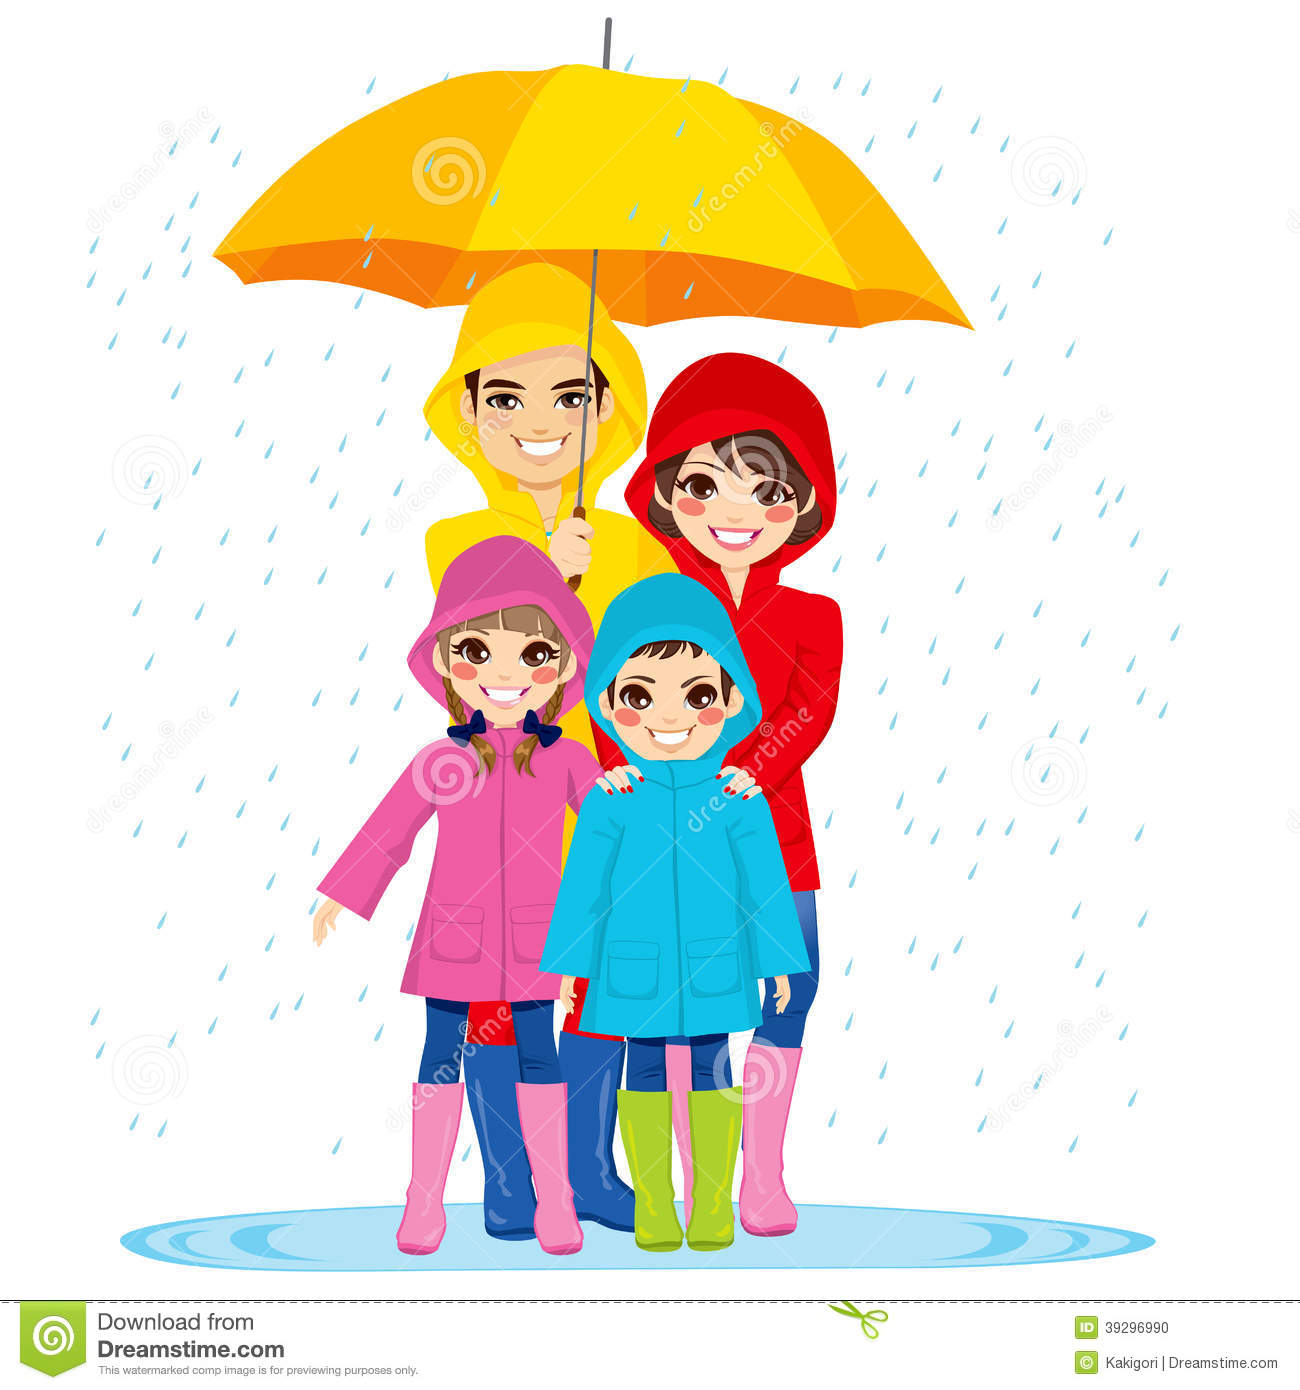 Rainy season clipart free download.